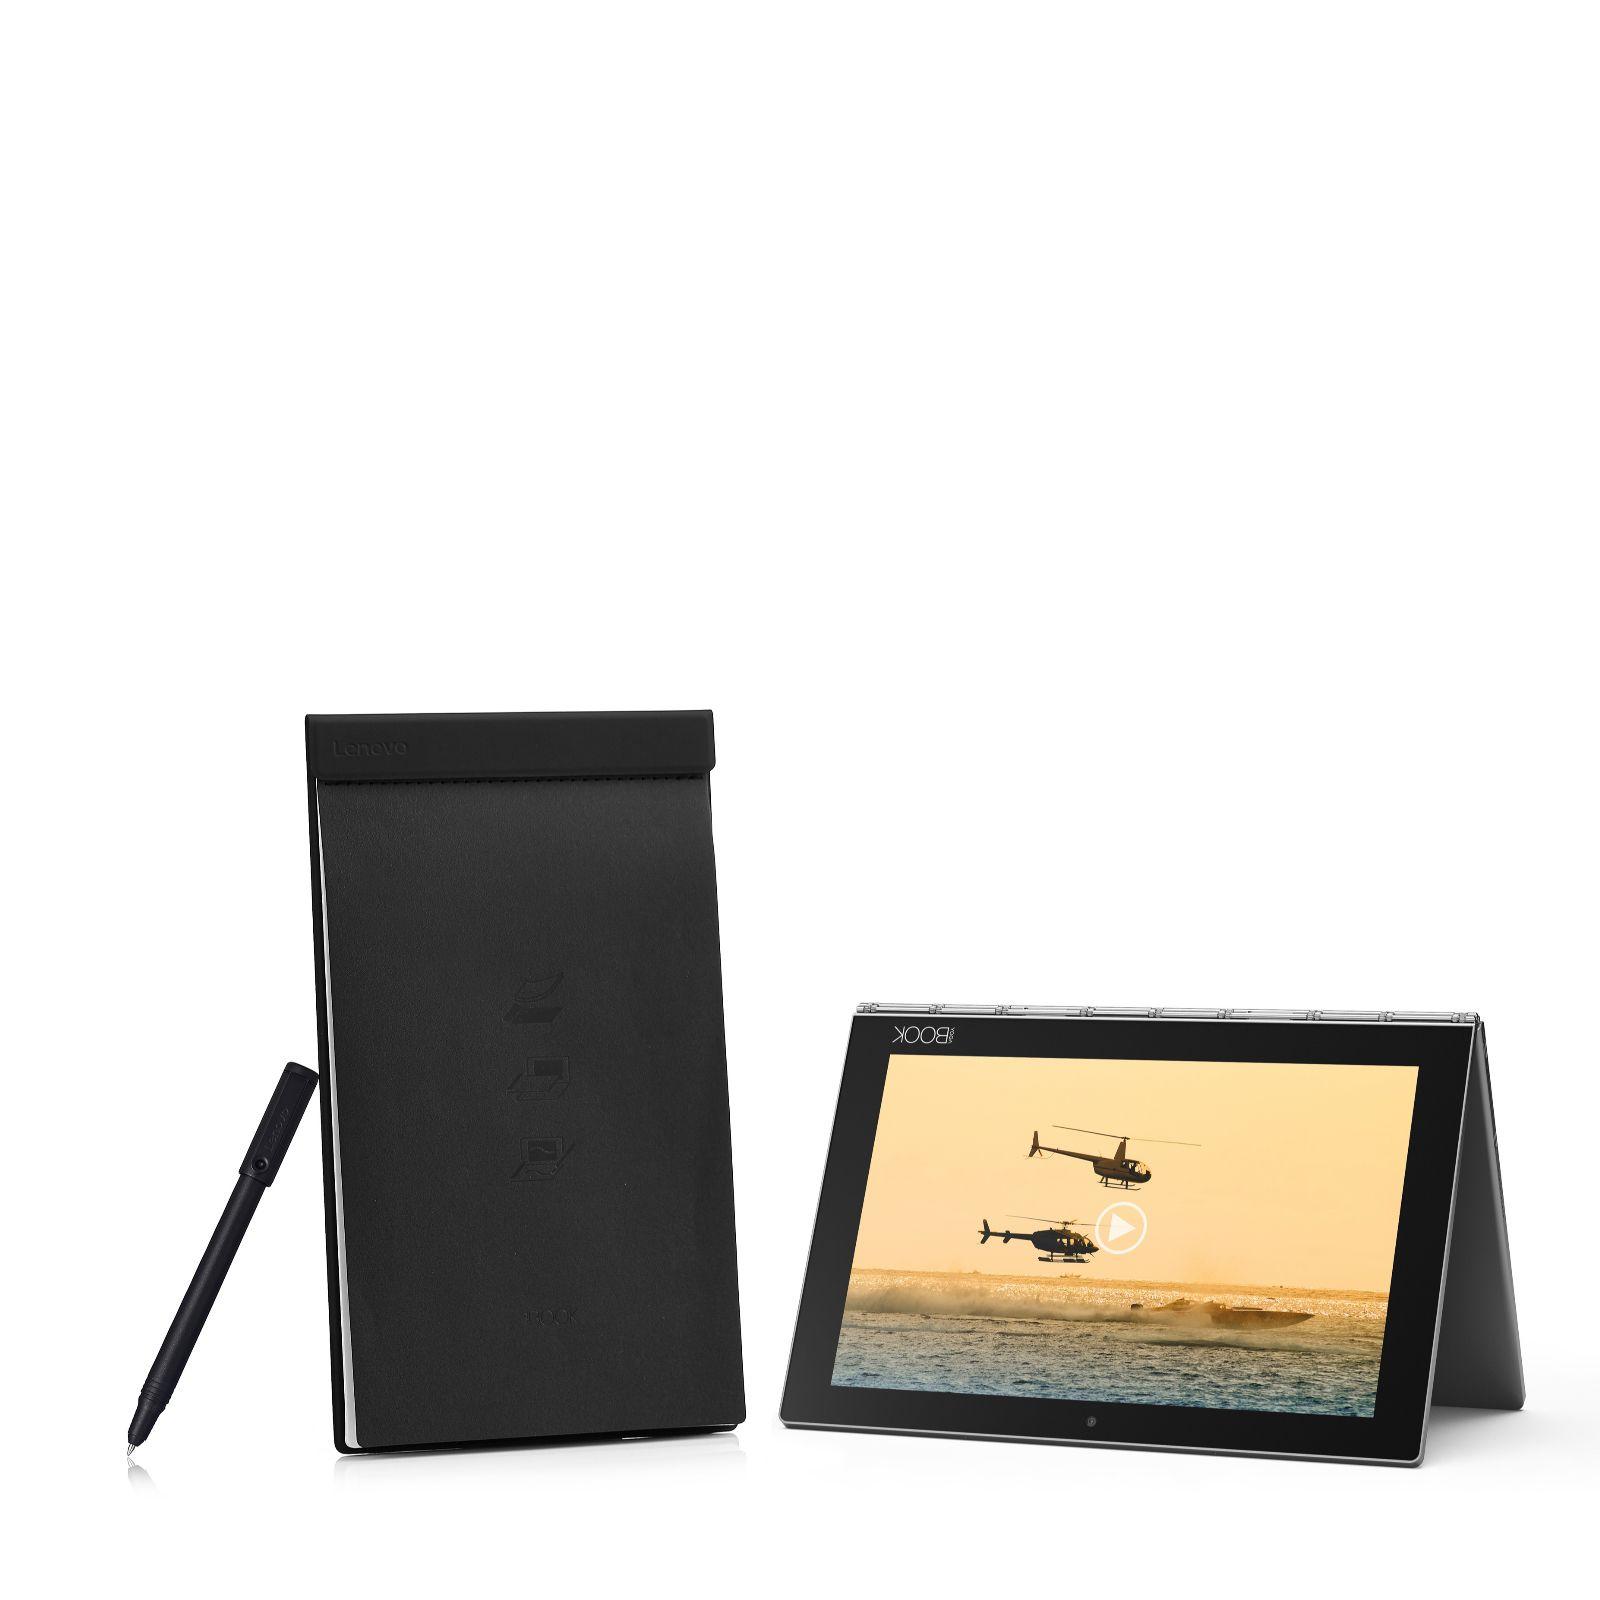 b8d2842386c Lenovo Yoga Book 10.1